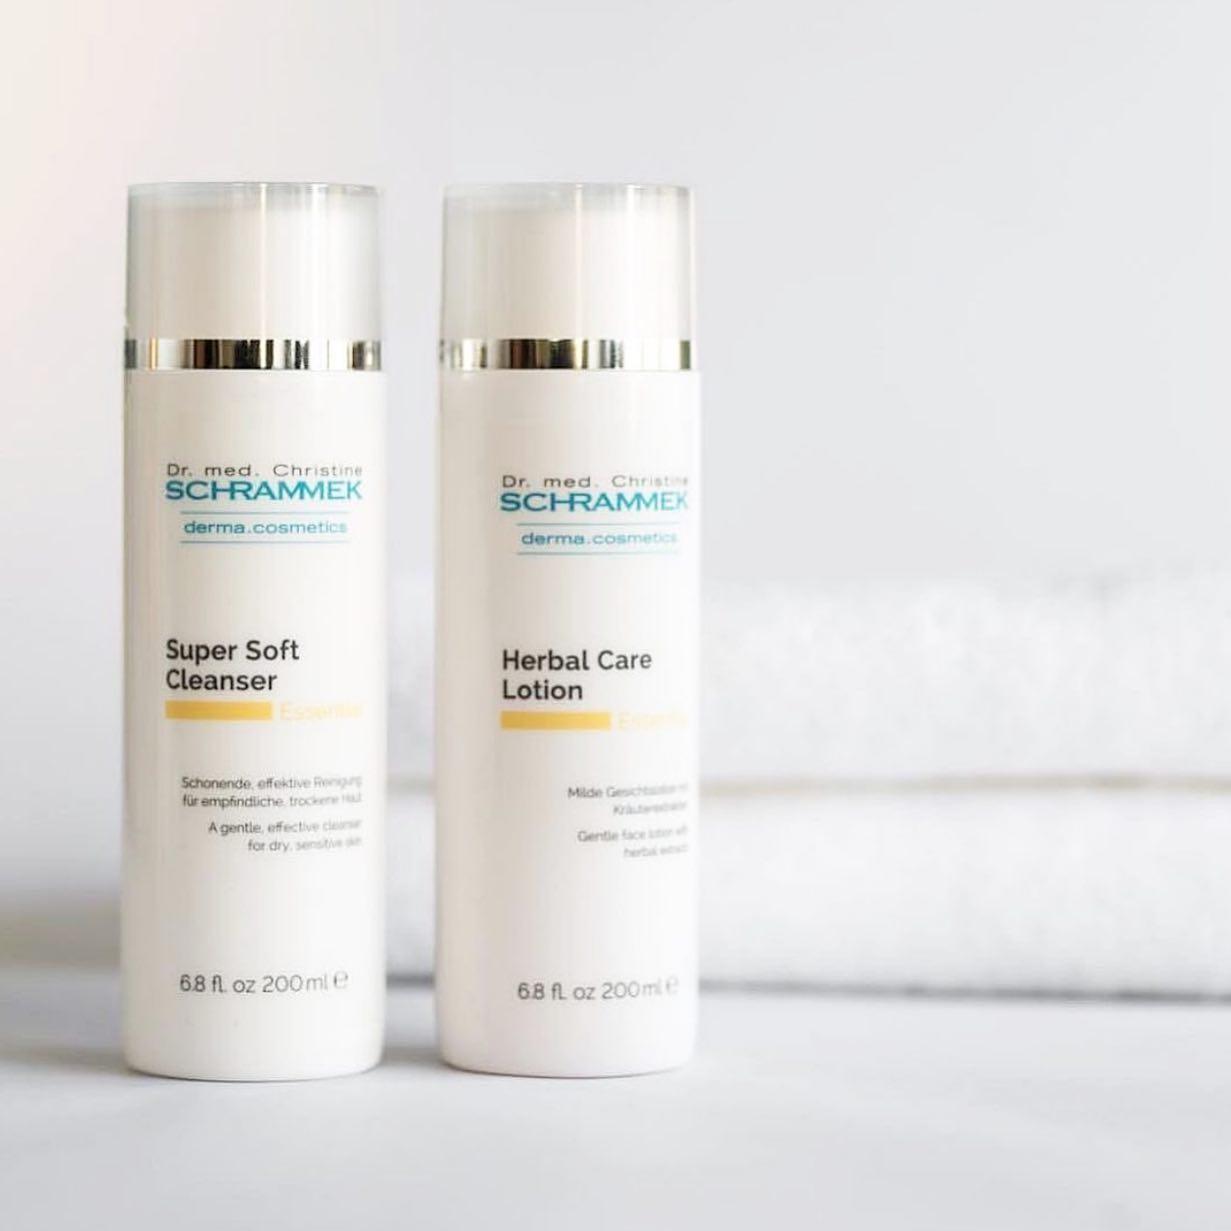 Deilige renseprodukter er ekte hverdagsluksus og et must for at huden skal fungere optimalt🧖🏼♀️   Step 1. Super Soft Cleanser:  Pleiende og beroligende rensemelk for normal, tørr og sensitiv hud. Fjerner makeup, smuss og forurensning skånsomt og effektivt på hud og øyeområdet uten å avfette.  Step 2. Herbal Care Lotion:  Beroligende, betennelsesdempende og rensende hudvann. Helende planteekstrakter balanserer og styrker huden. Påføres med bomullspads etter Super Soft Cleanser. Fjerner også øye-makeup.